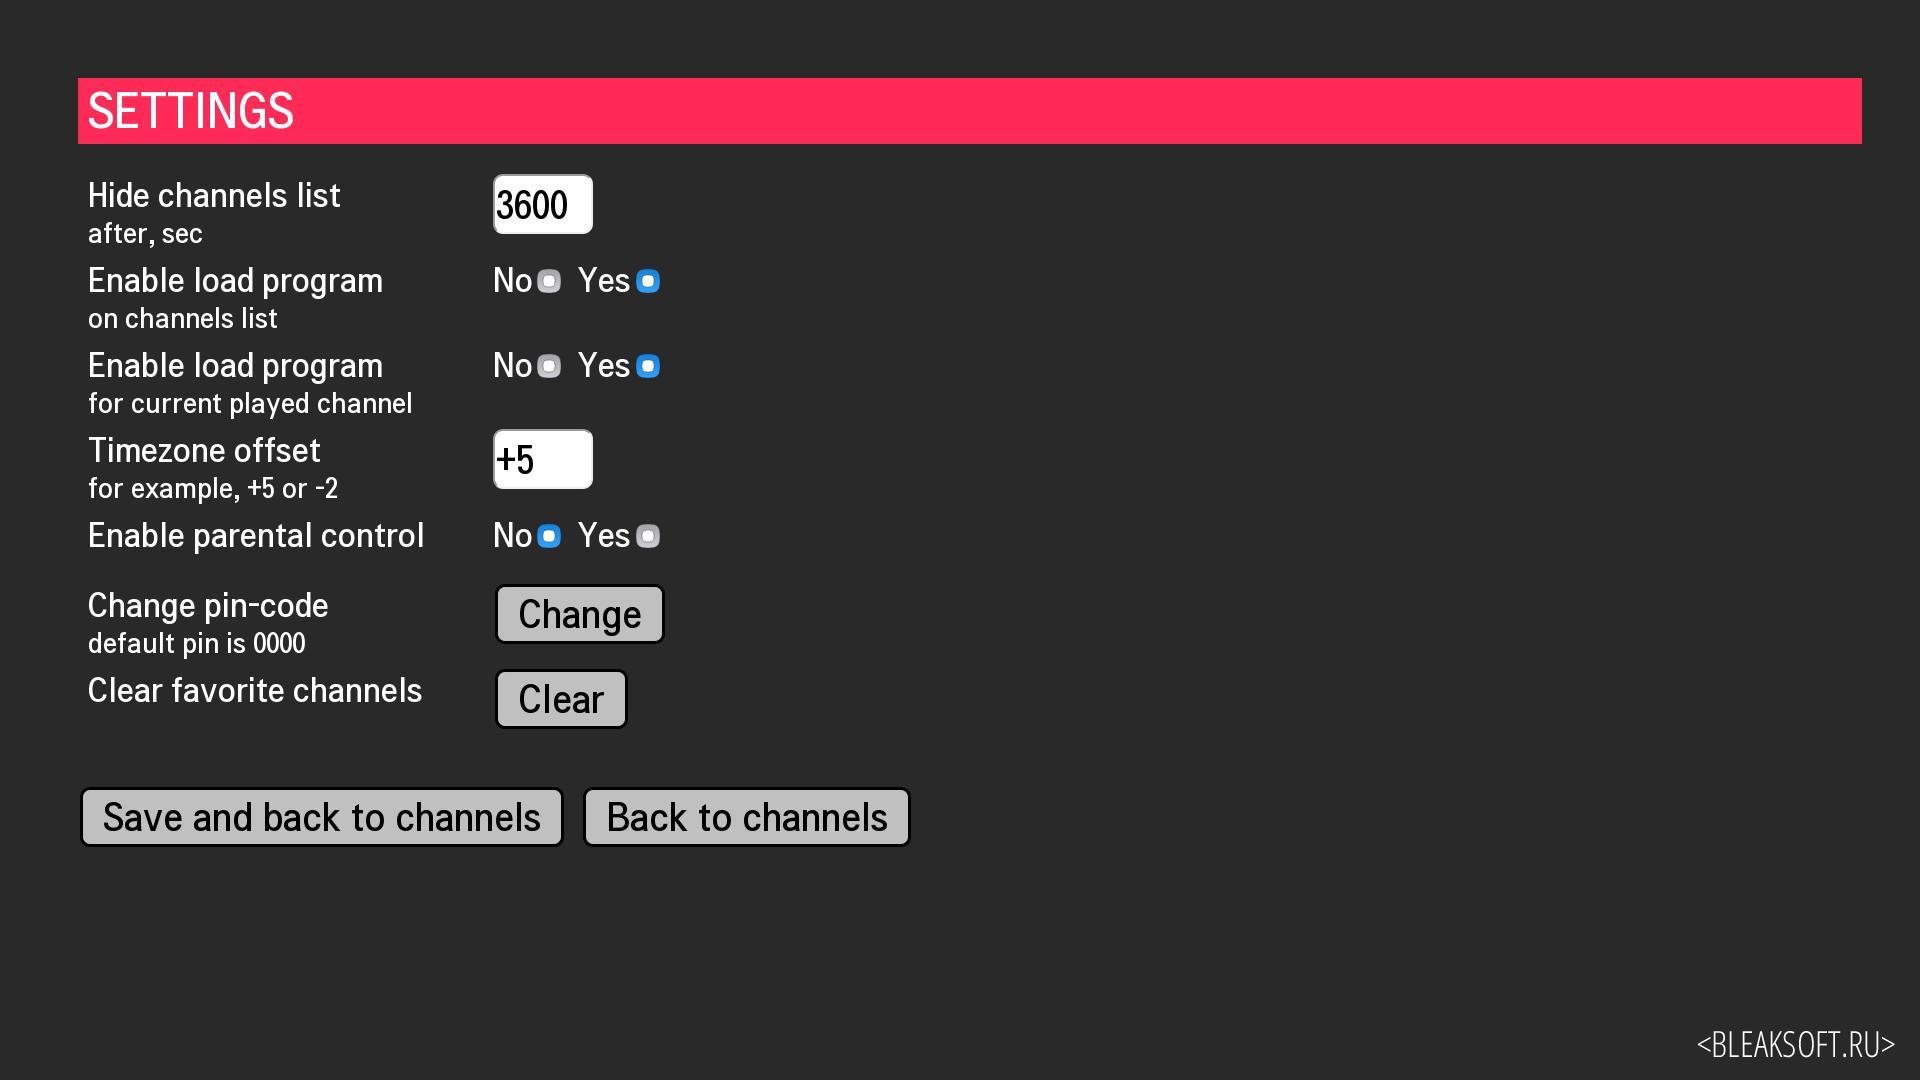 каменсктелеком simple tv kt